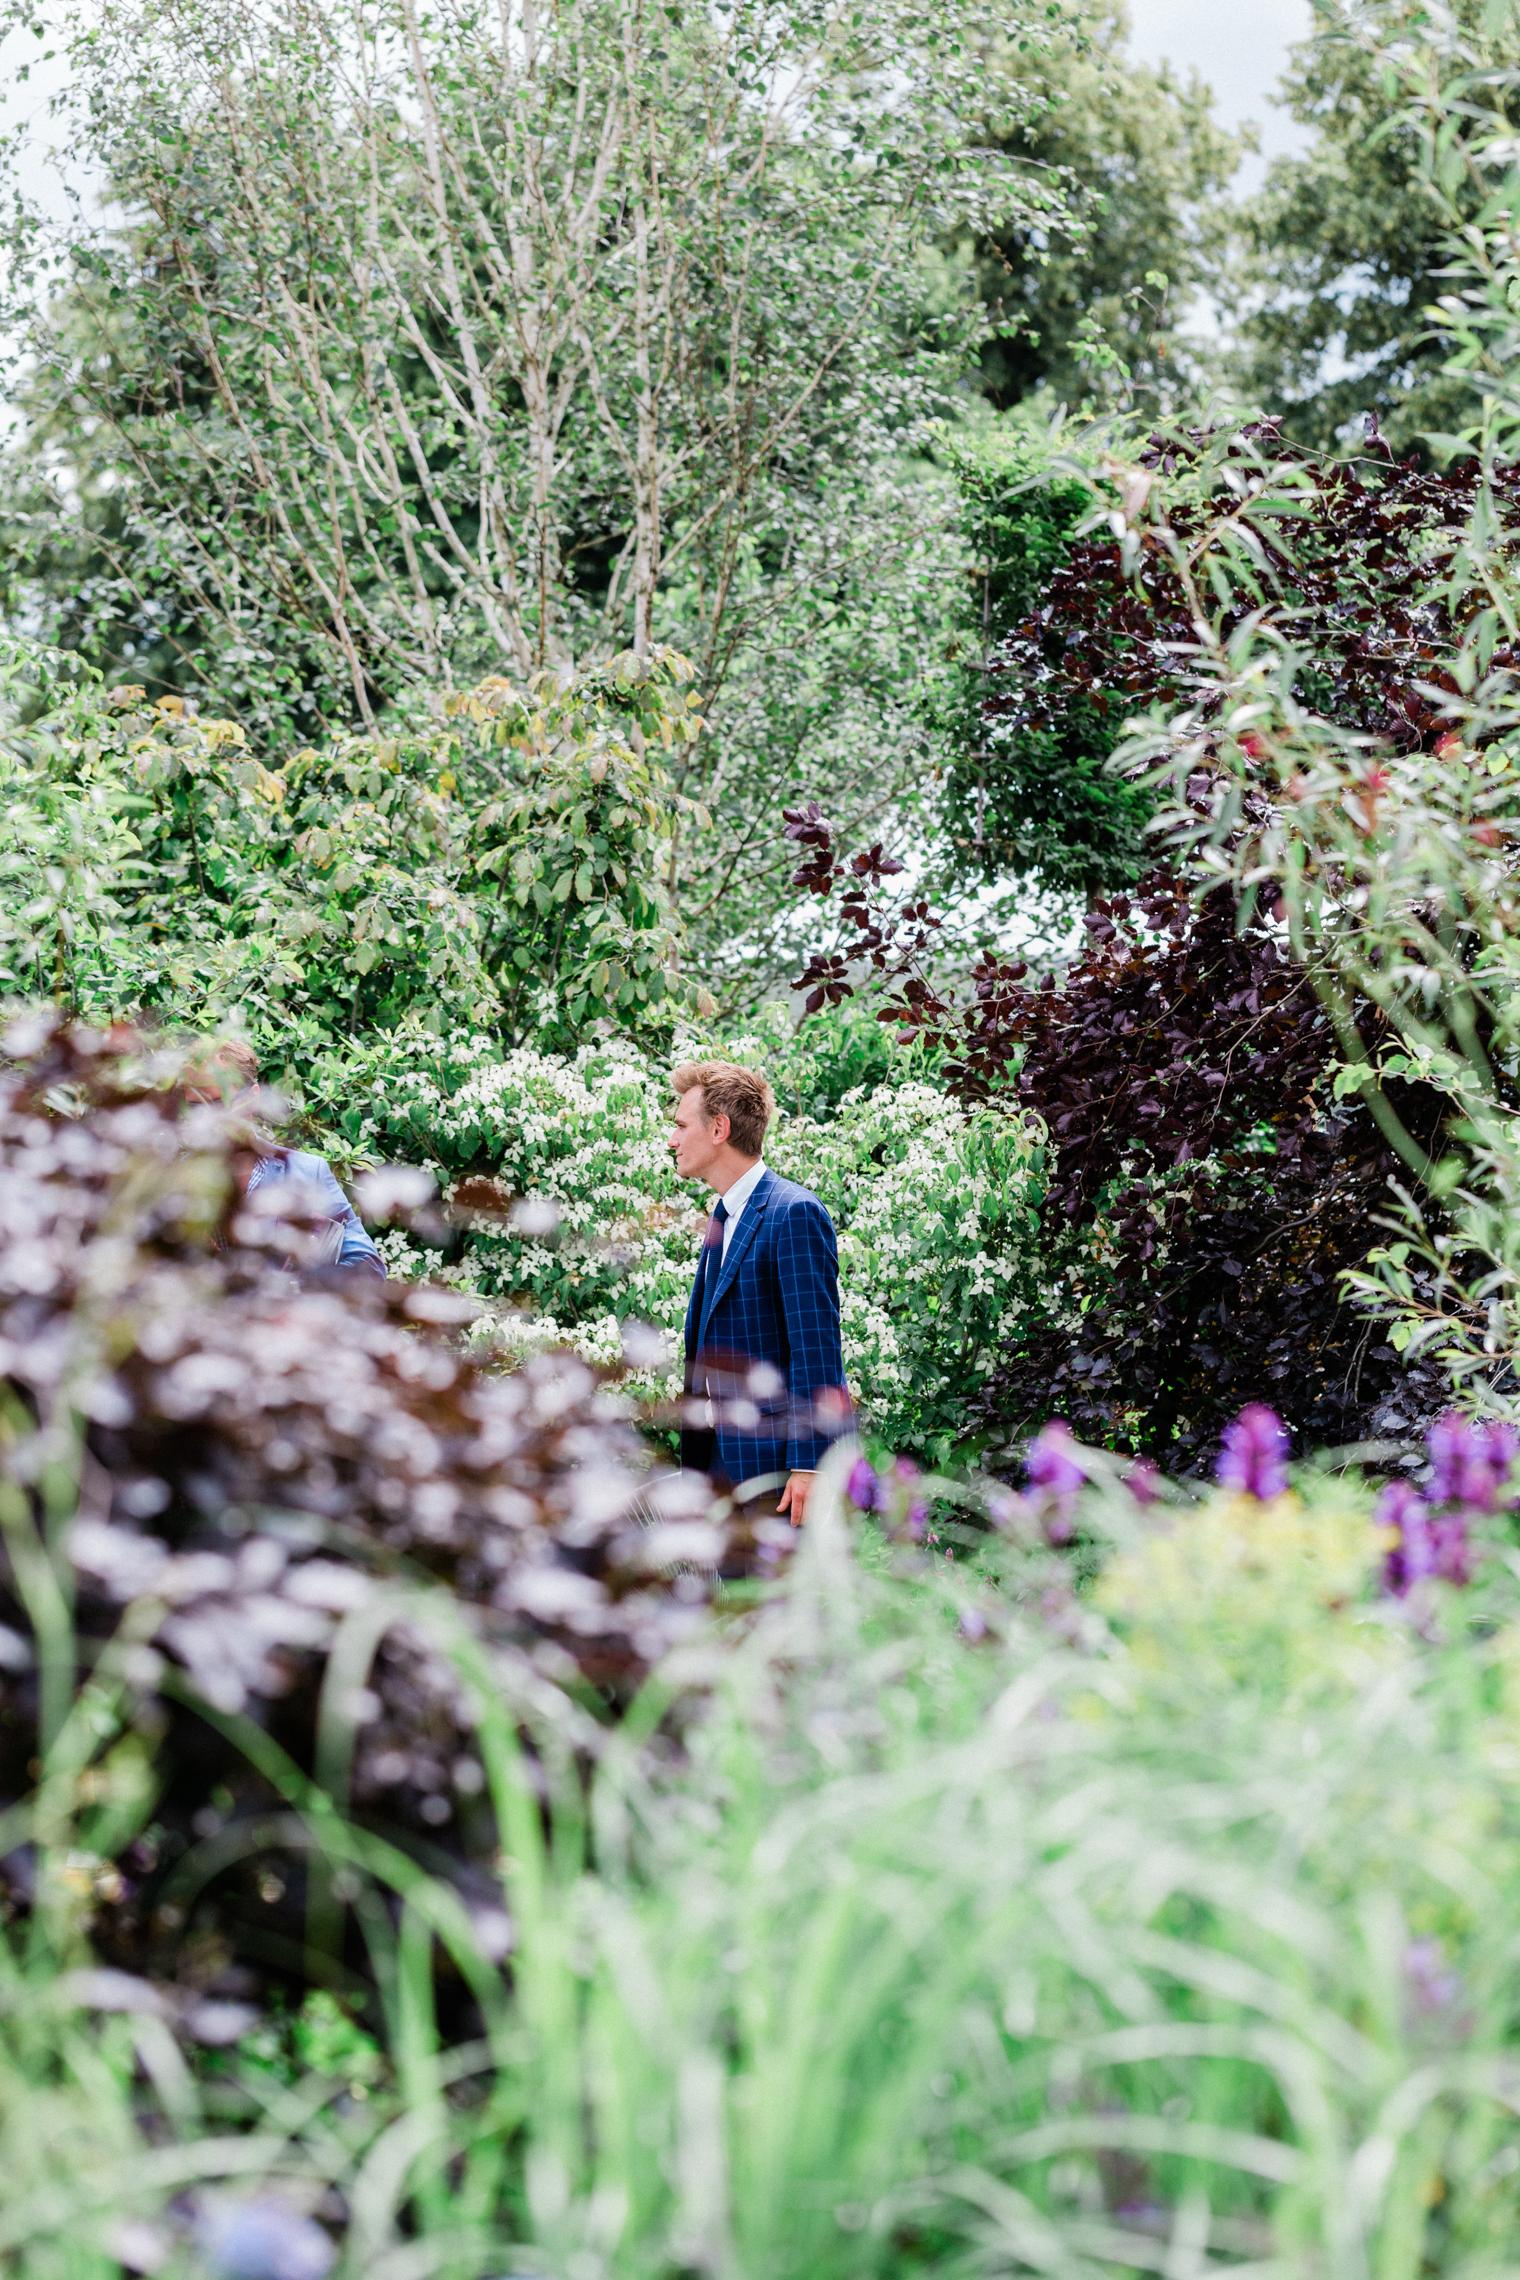 Jamie Butterworth Form Plants